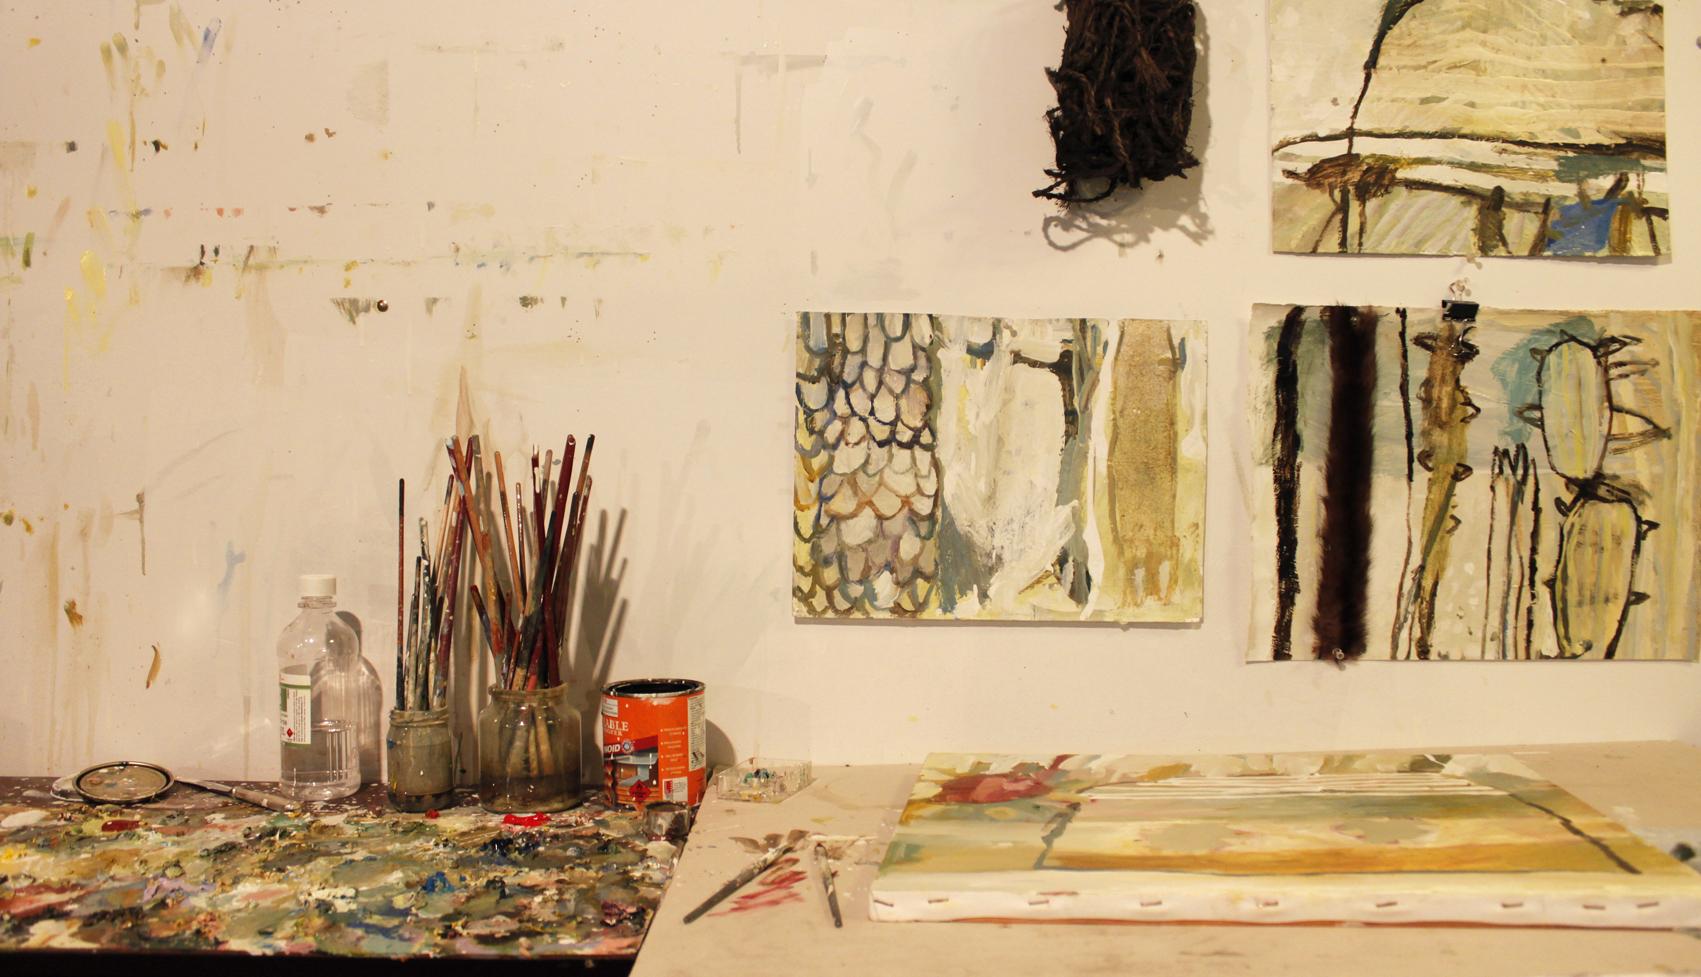 Australian Artist studio visit - Jaq Davies, The Corner Store Gallery, Orange NSW, photograph by Madeline Young